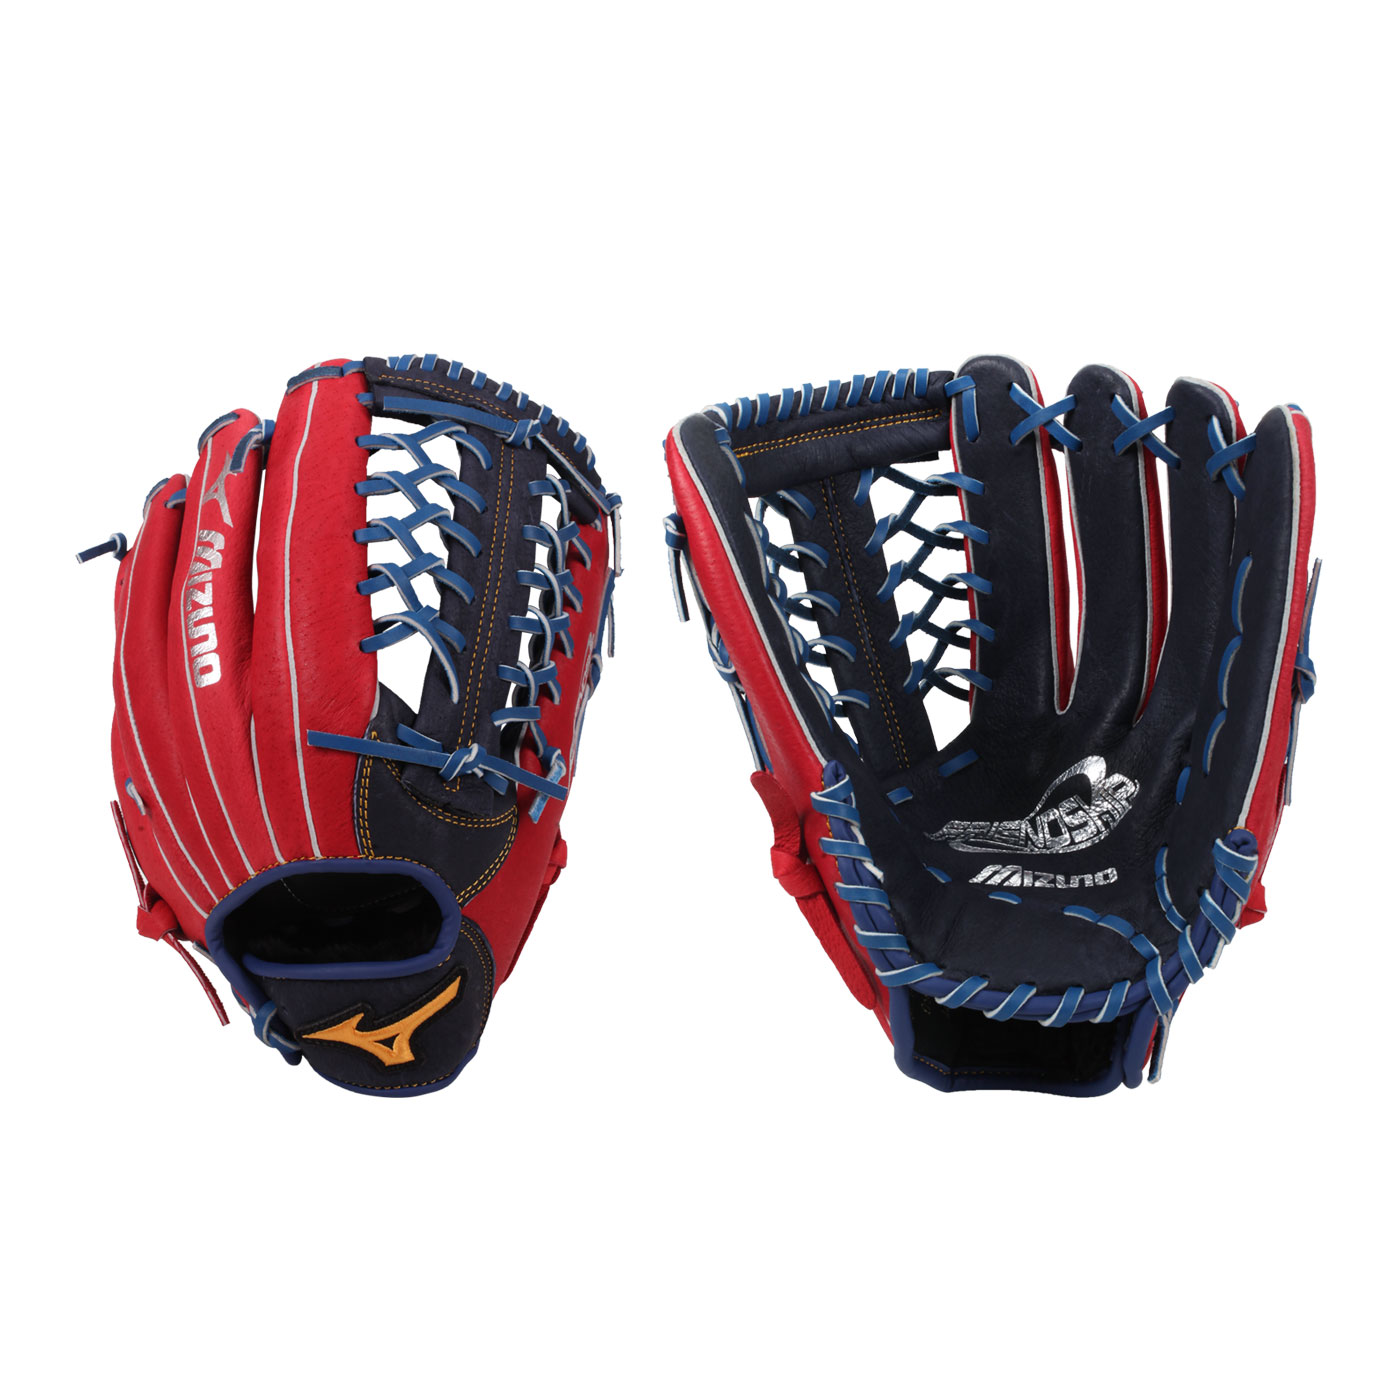 MIZUNO 壘球手套 1ATGS21960-2962 - 紅丈青黃